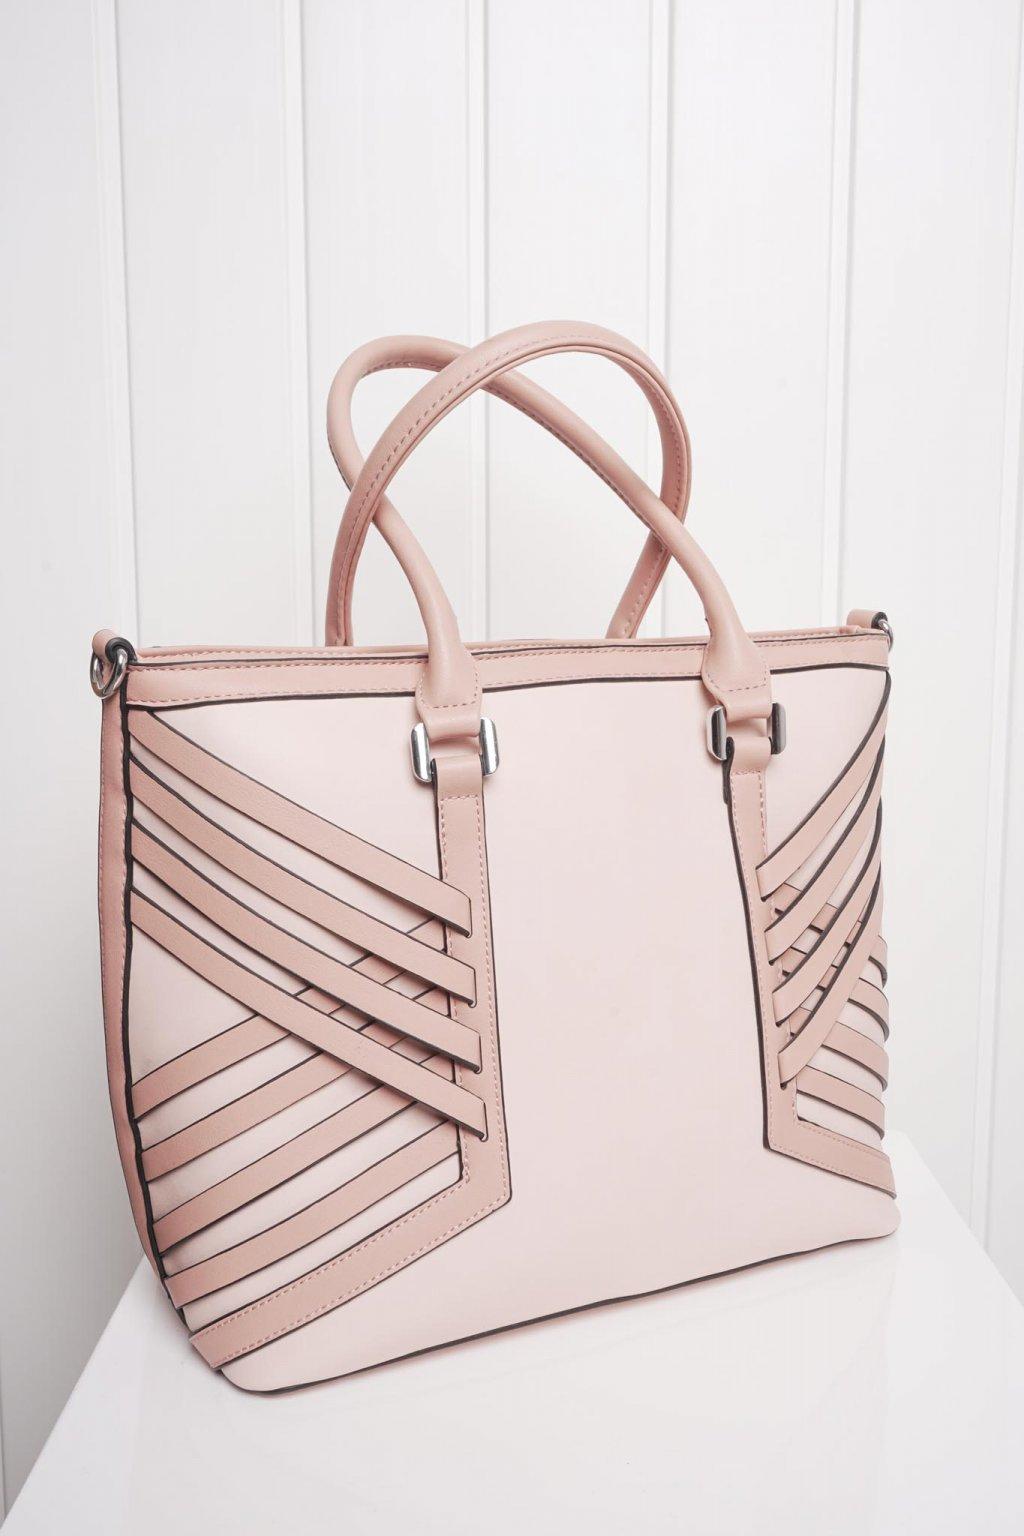 Kabelka, ruksak, dobrá cena, čierna kabelka, čierny ruksak, basic, kabelky, ruksaky 158